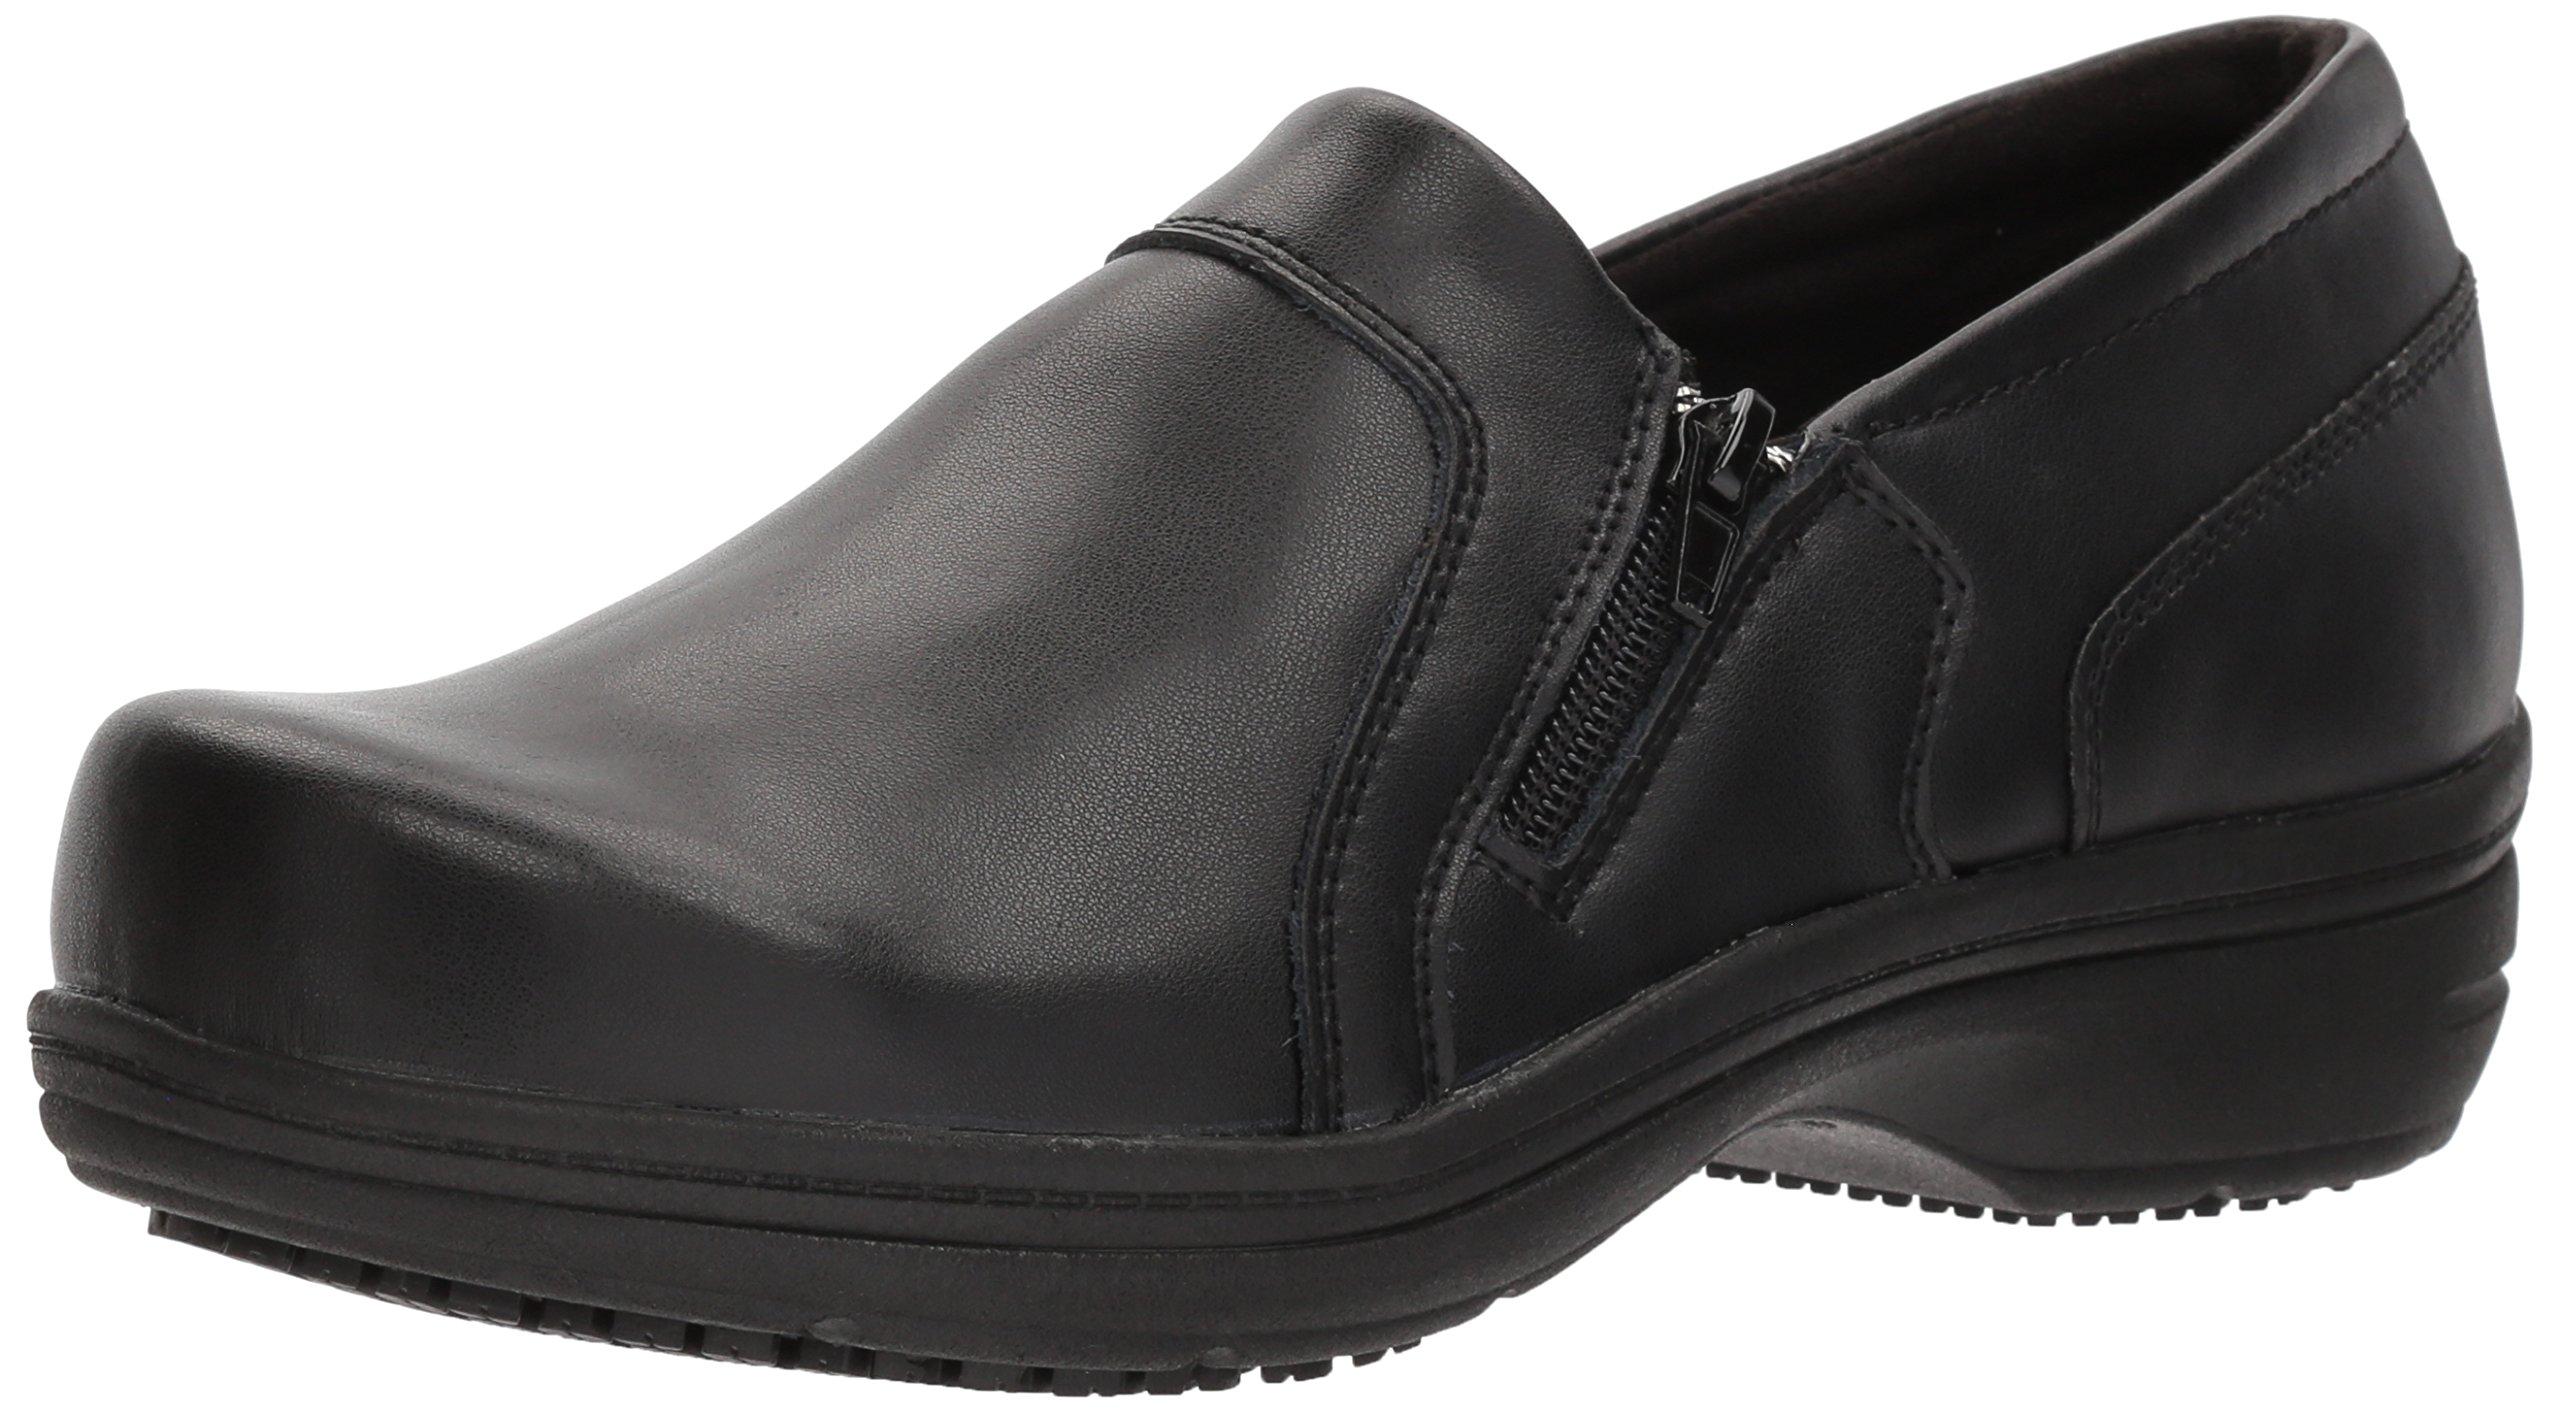 Easy Works Women's Bentley Health Care Professional Shoe, Black, 12 W US